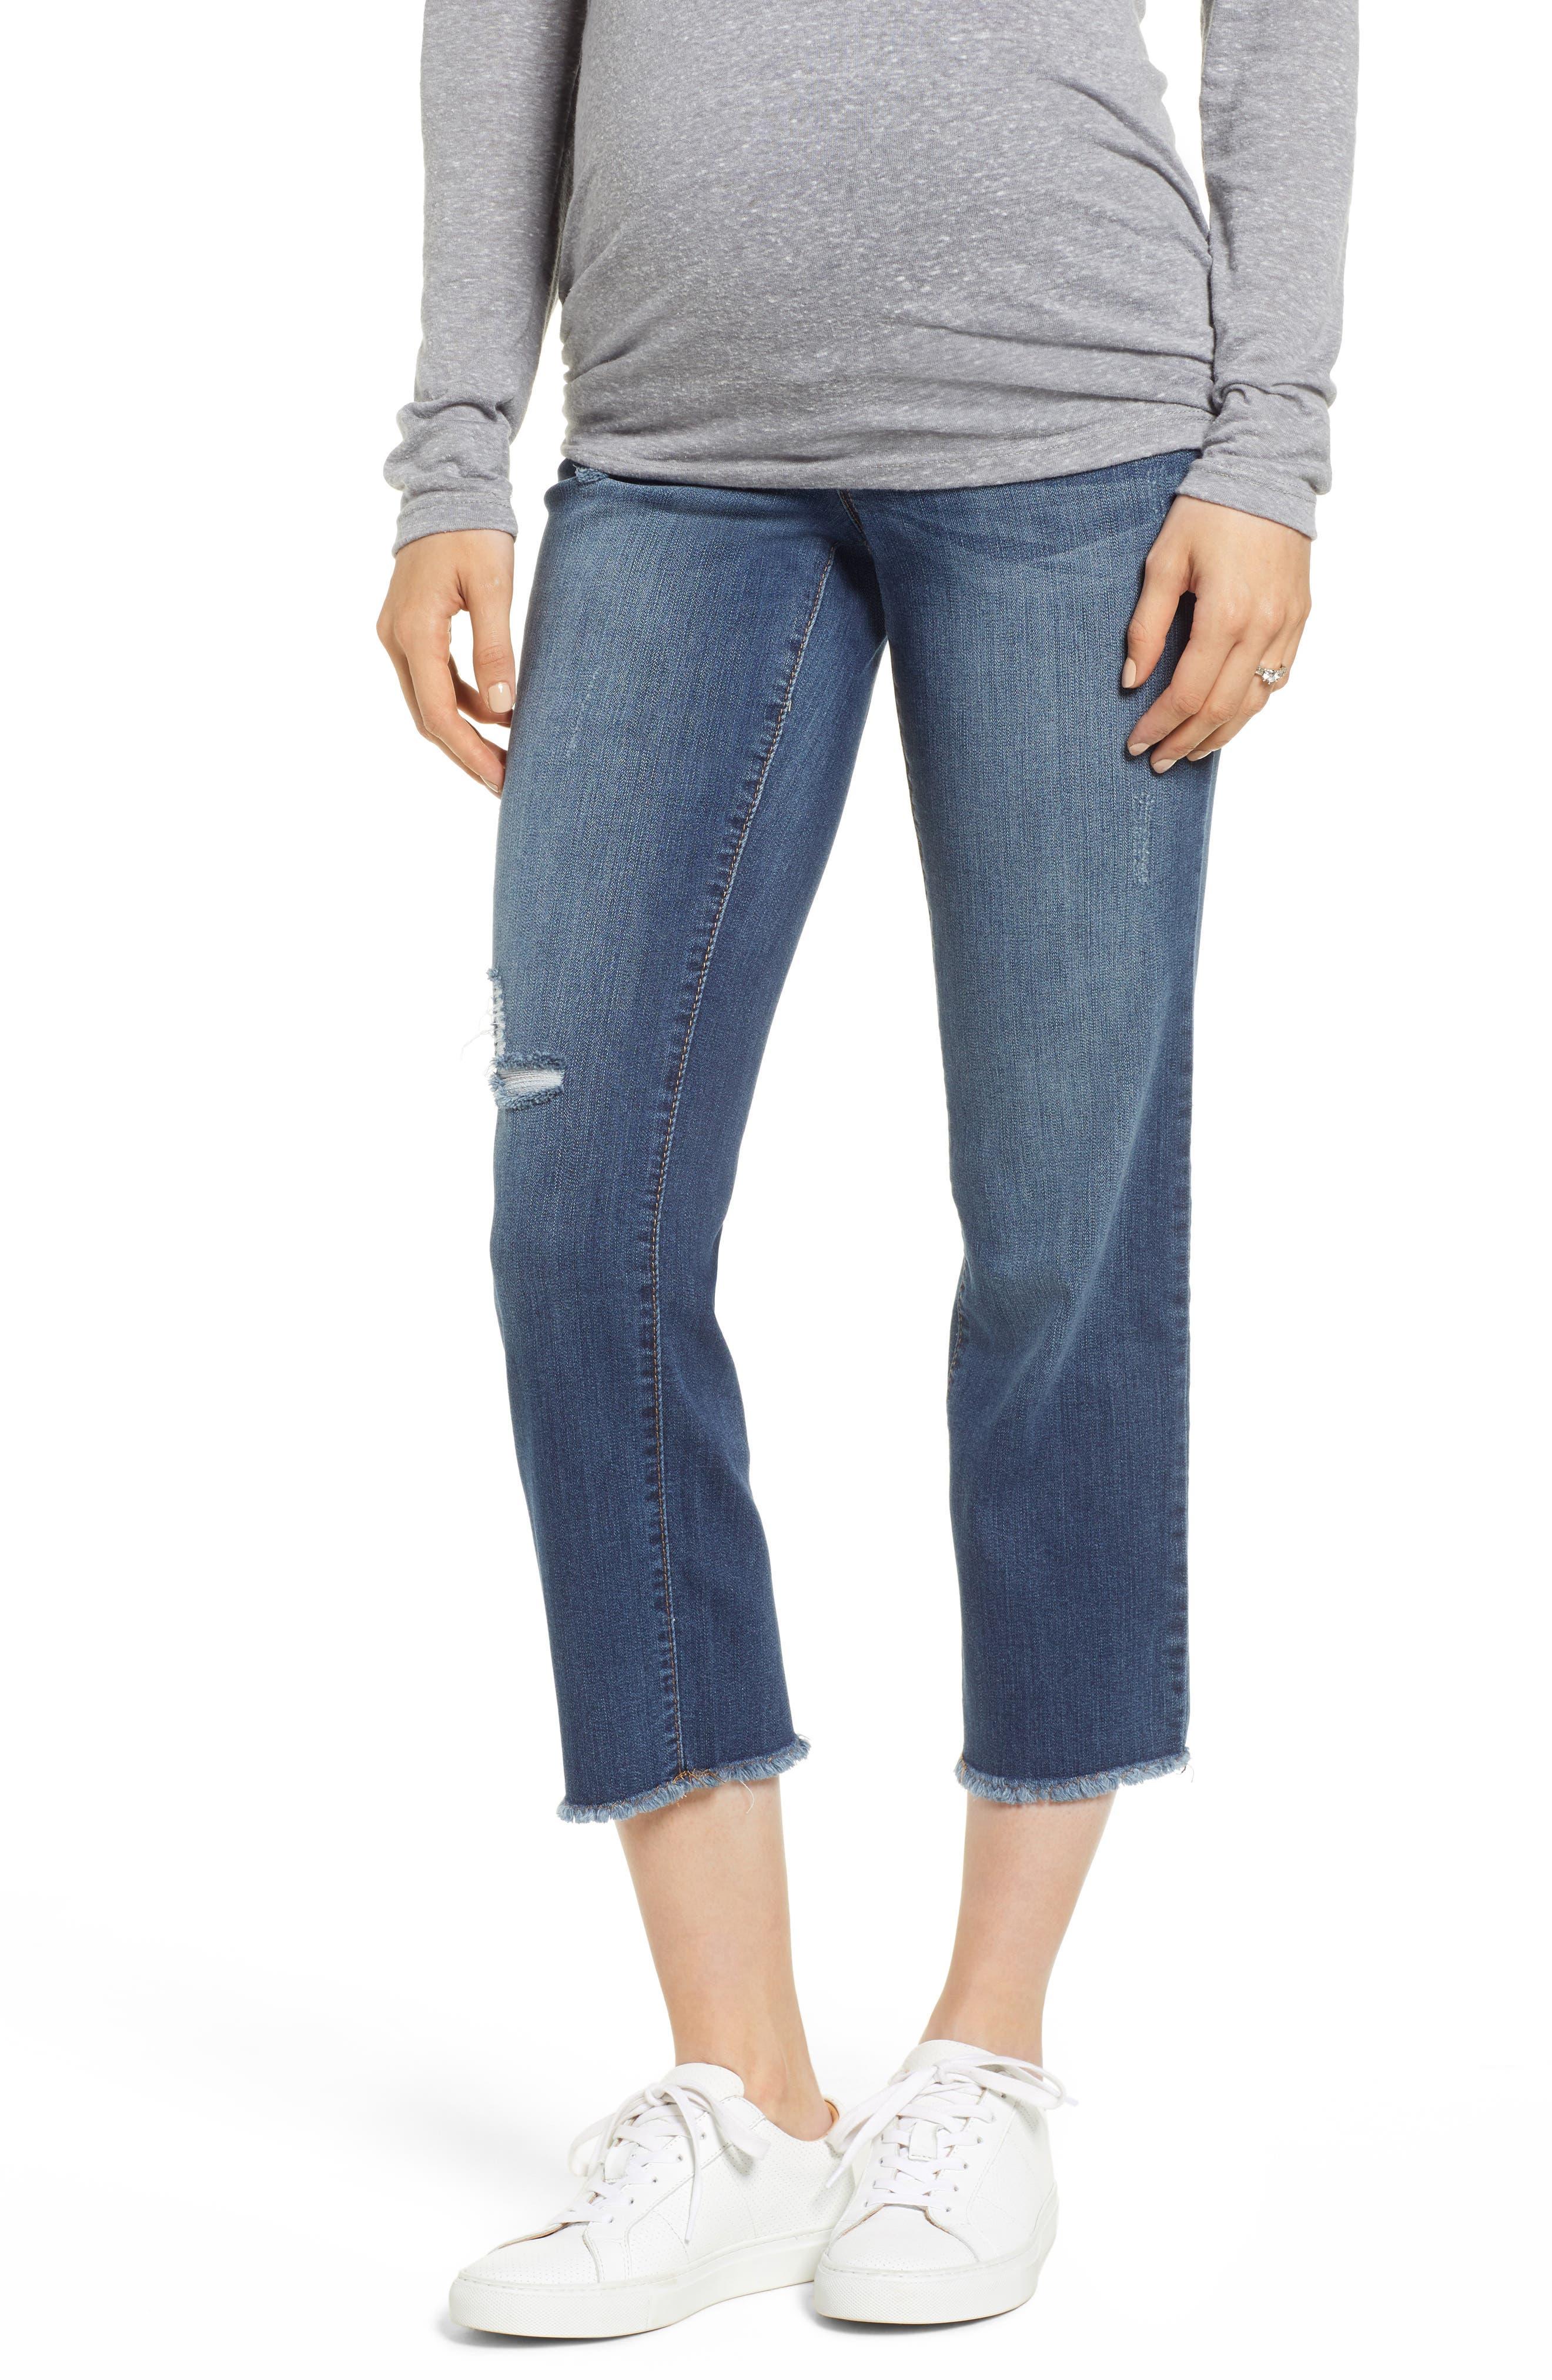 Cassie Crop Straight Leg Maternity Jeans,                             Main thumbnail 1, color,                             CASSIE